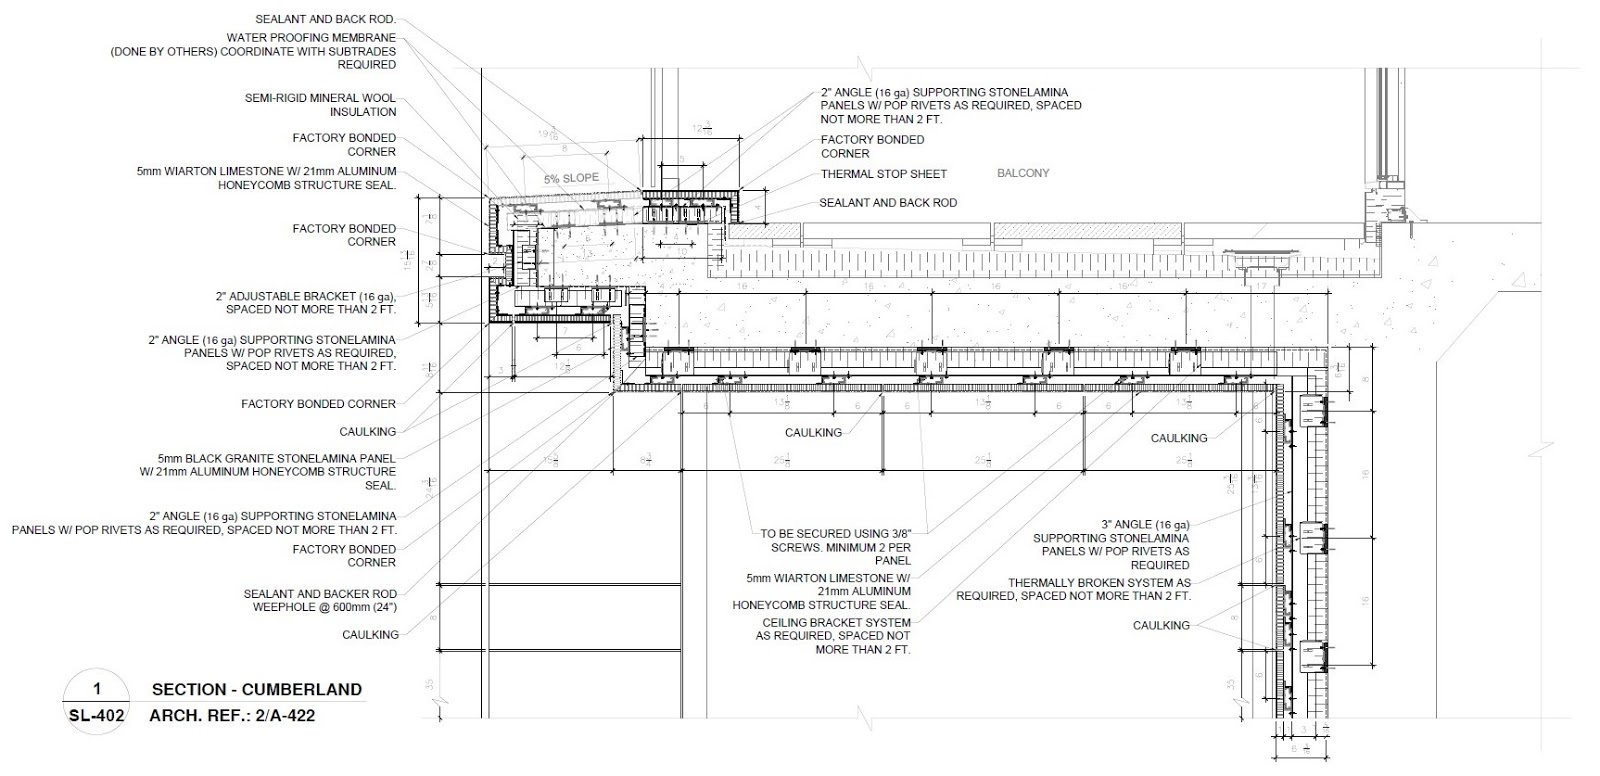 prepare and design shop drawings details and cutsheet packages bom etc  [ 1600 x 776 Pixel ]